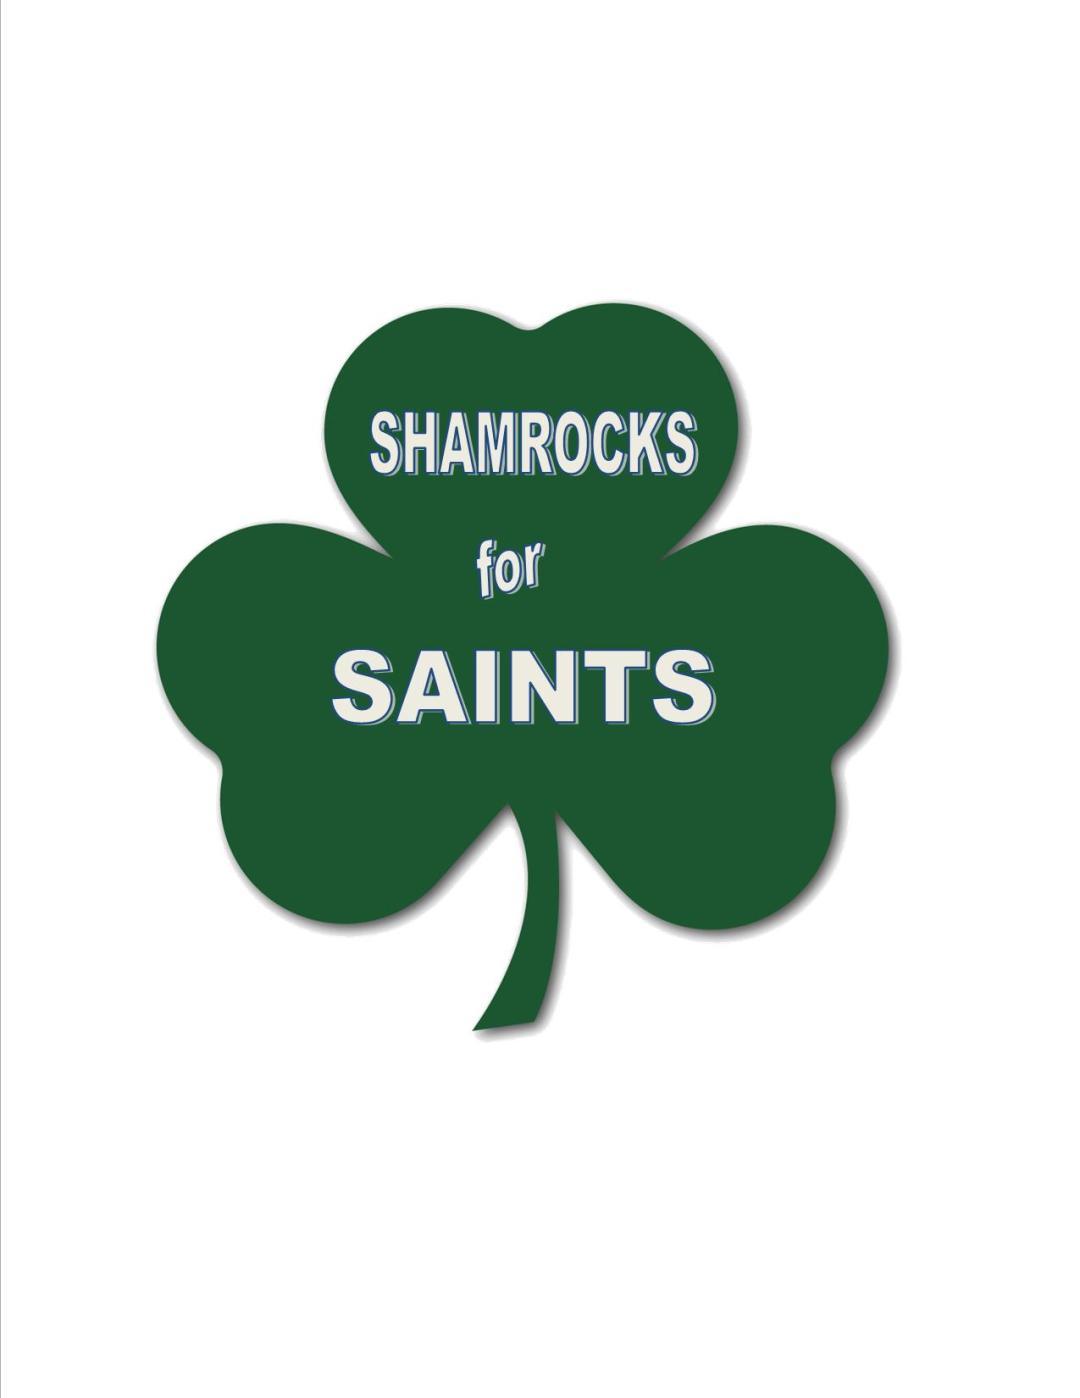 shamrock - Shamrocks for Saints